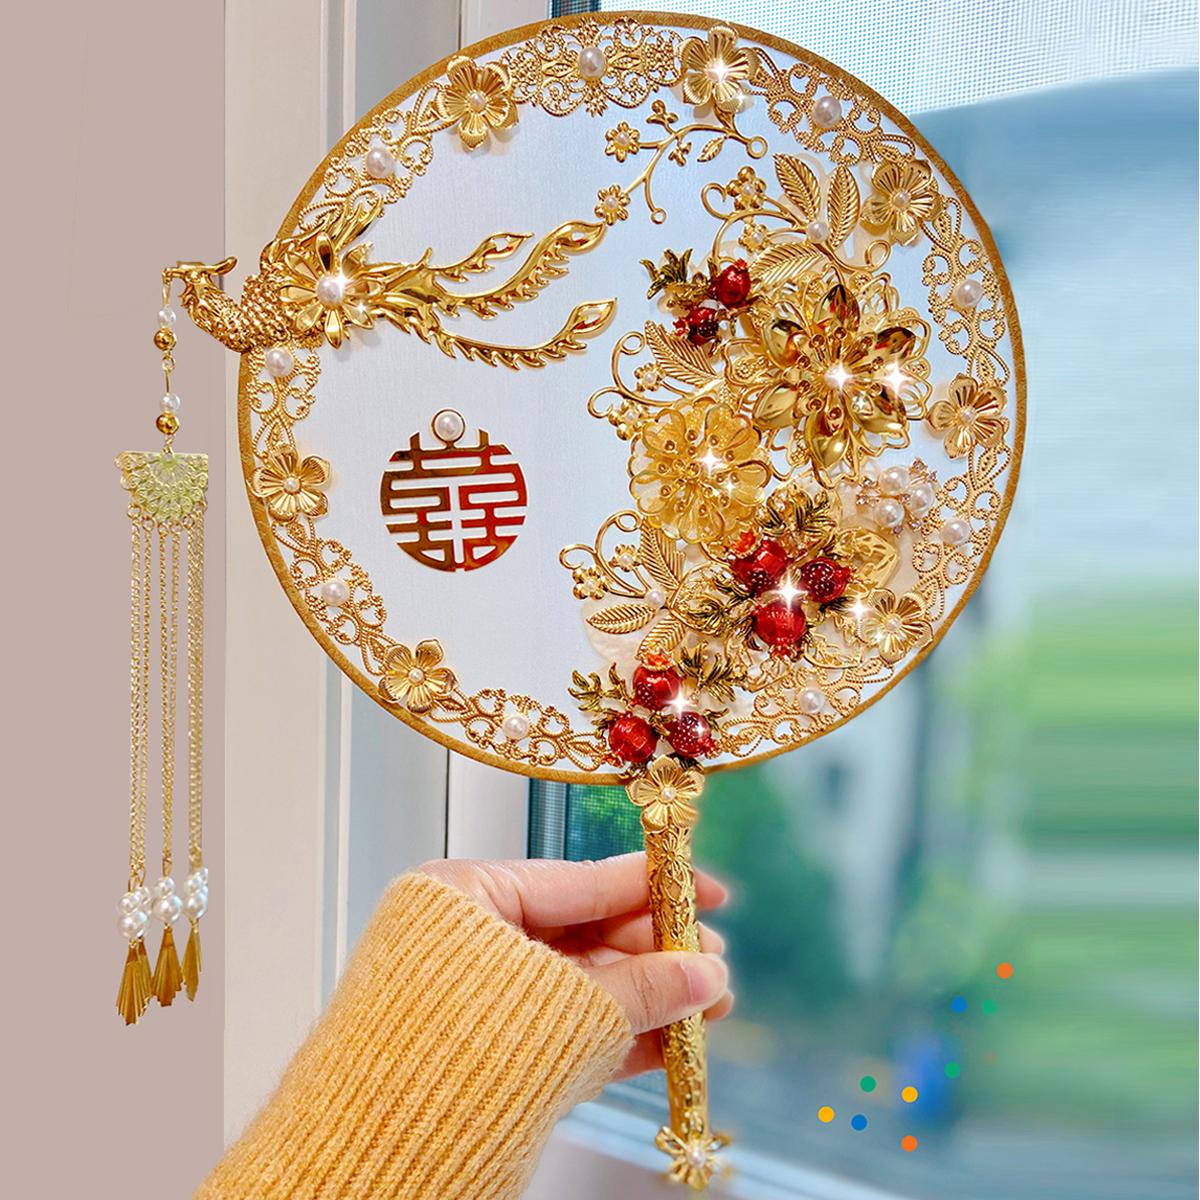 Bride Chinese wedding troupe fan ancient wind wedding fan show clothes fan hand holding flower fan DIY material bag